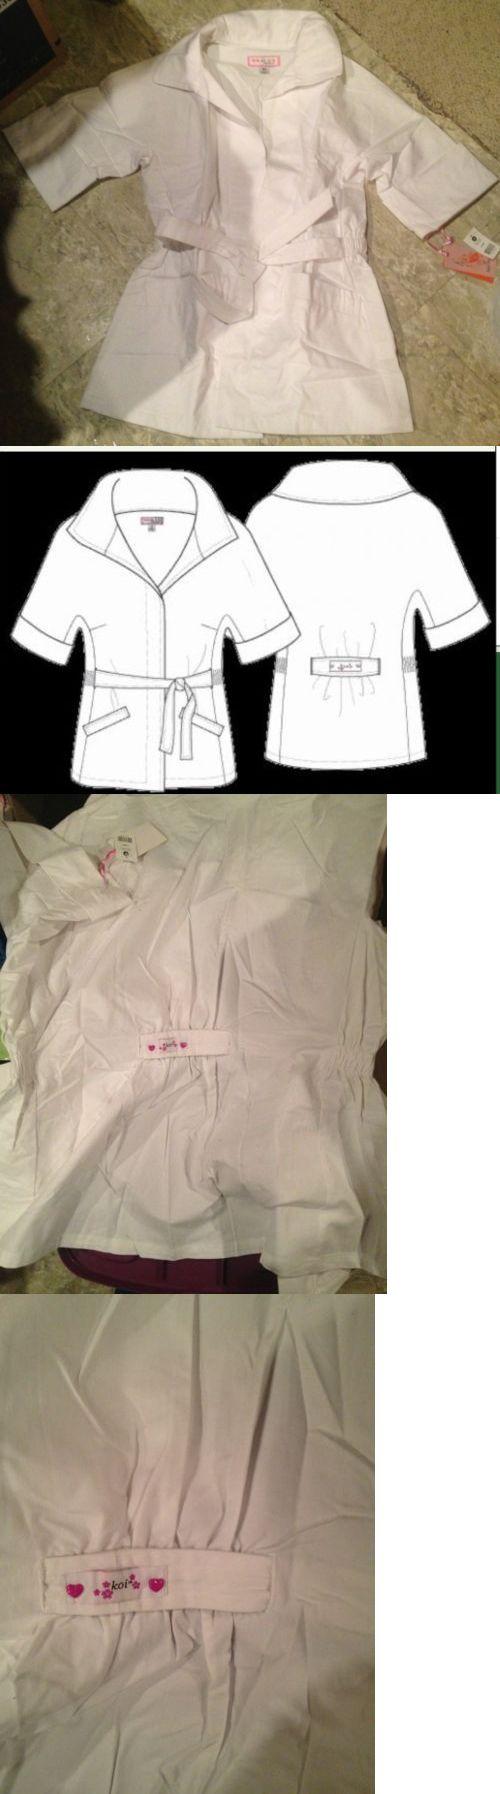 Lab Coats 105417: New! Koi By Kathy Peterson Sydney White Lab Coat Scrub Jacket! Size Xs! Feminine -> BUY IT NOW ONLY: $44.99 on eBay!